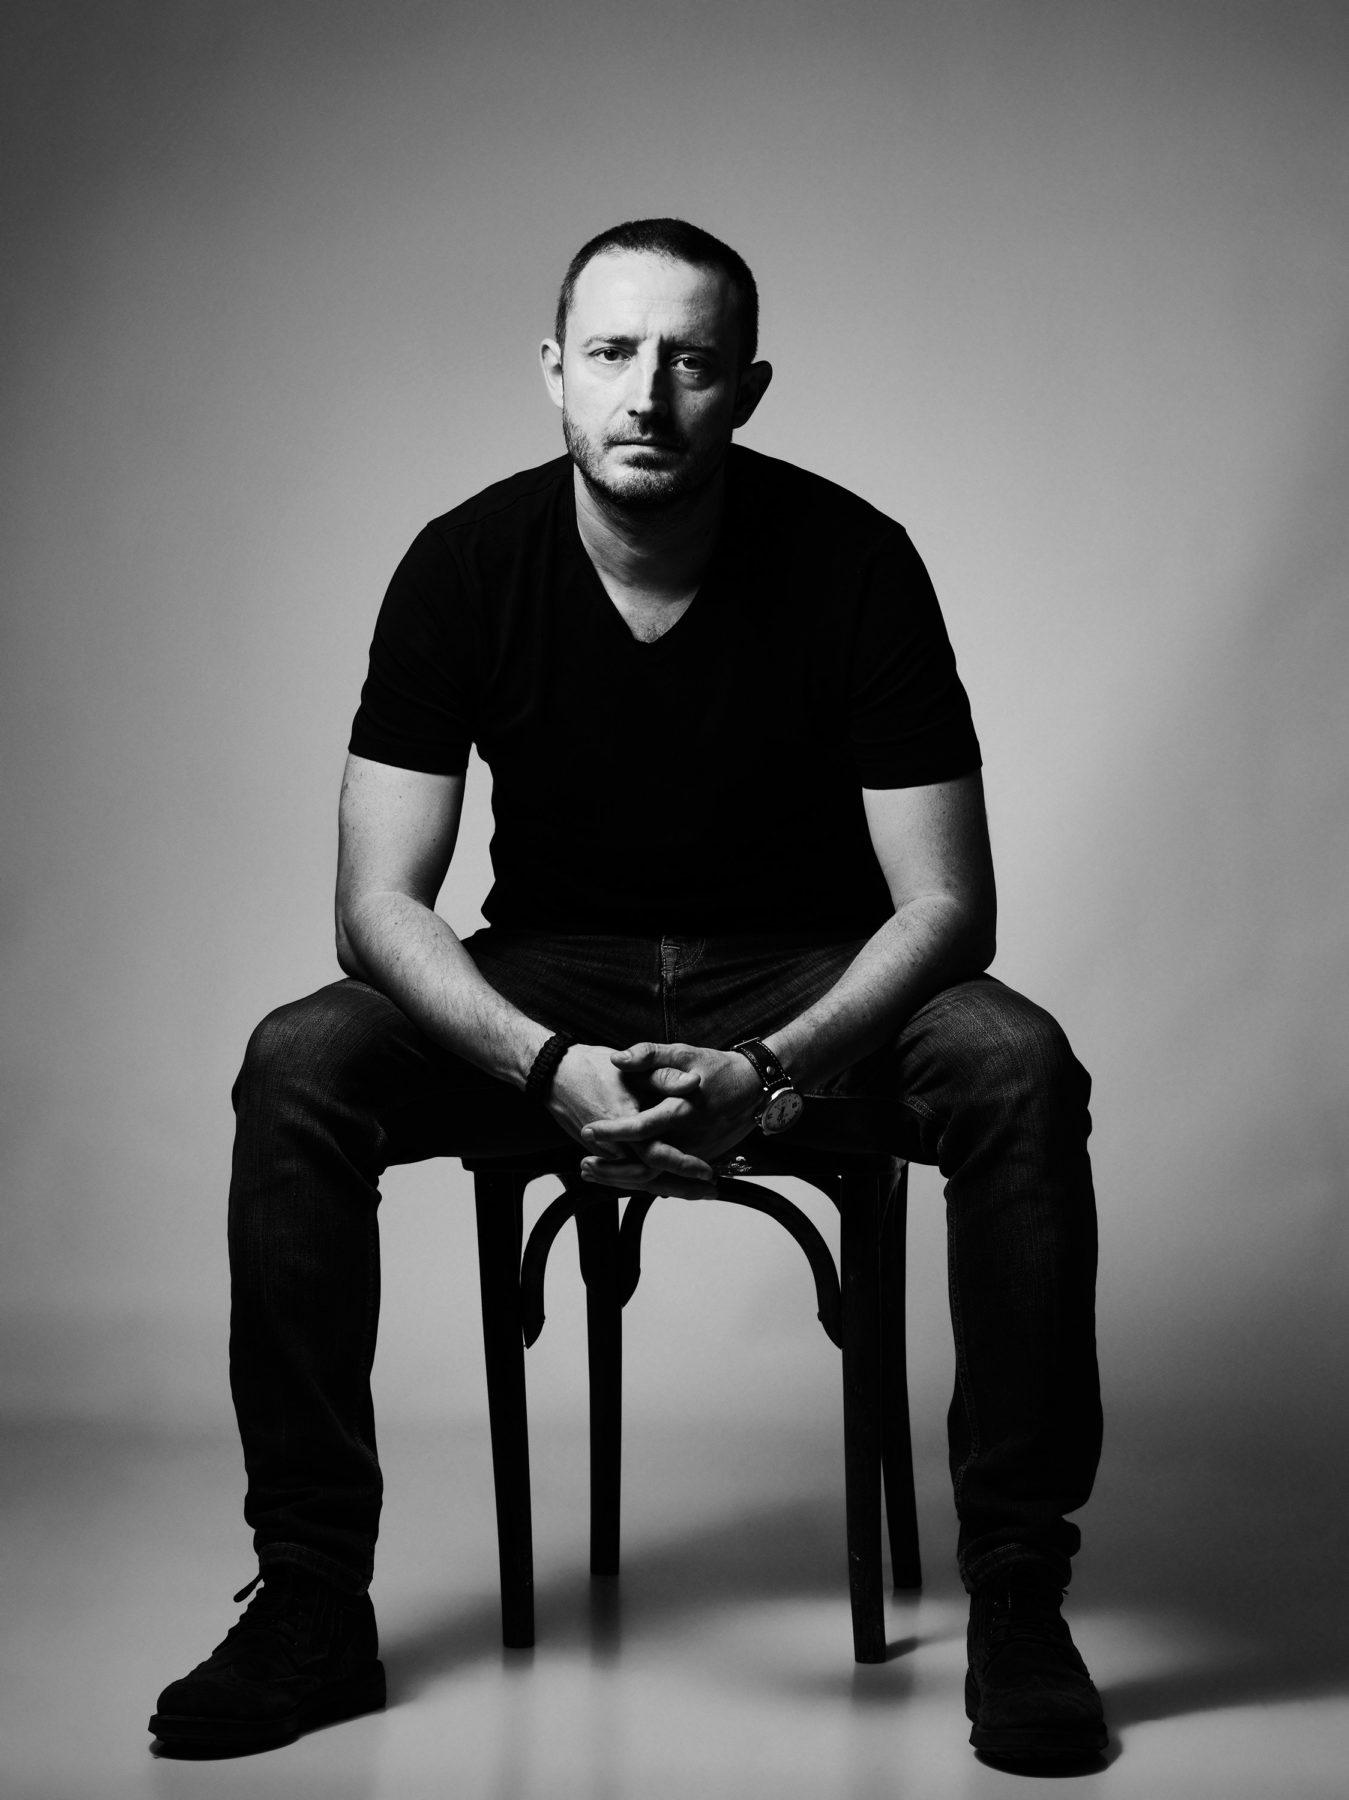 Photo by Nebojsa Babic